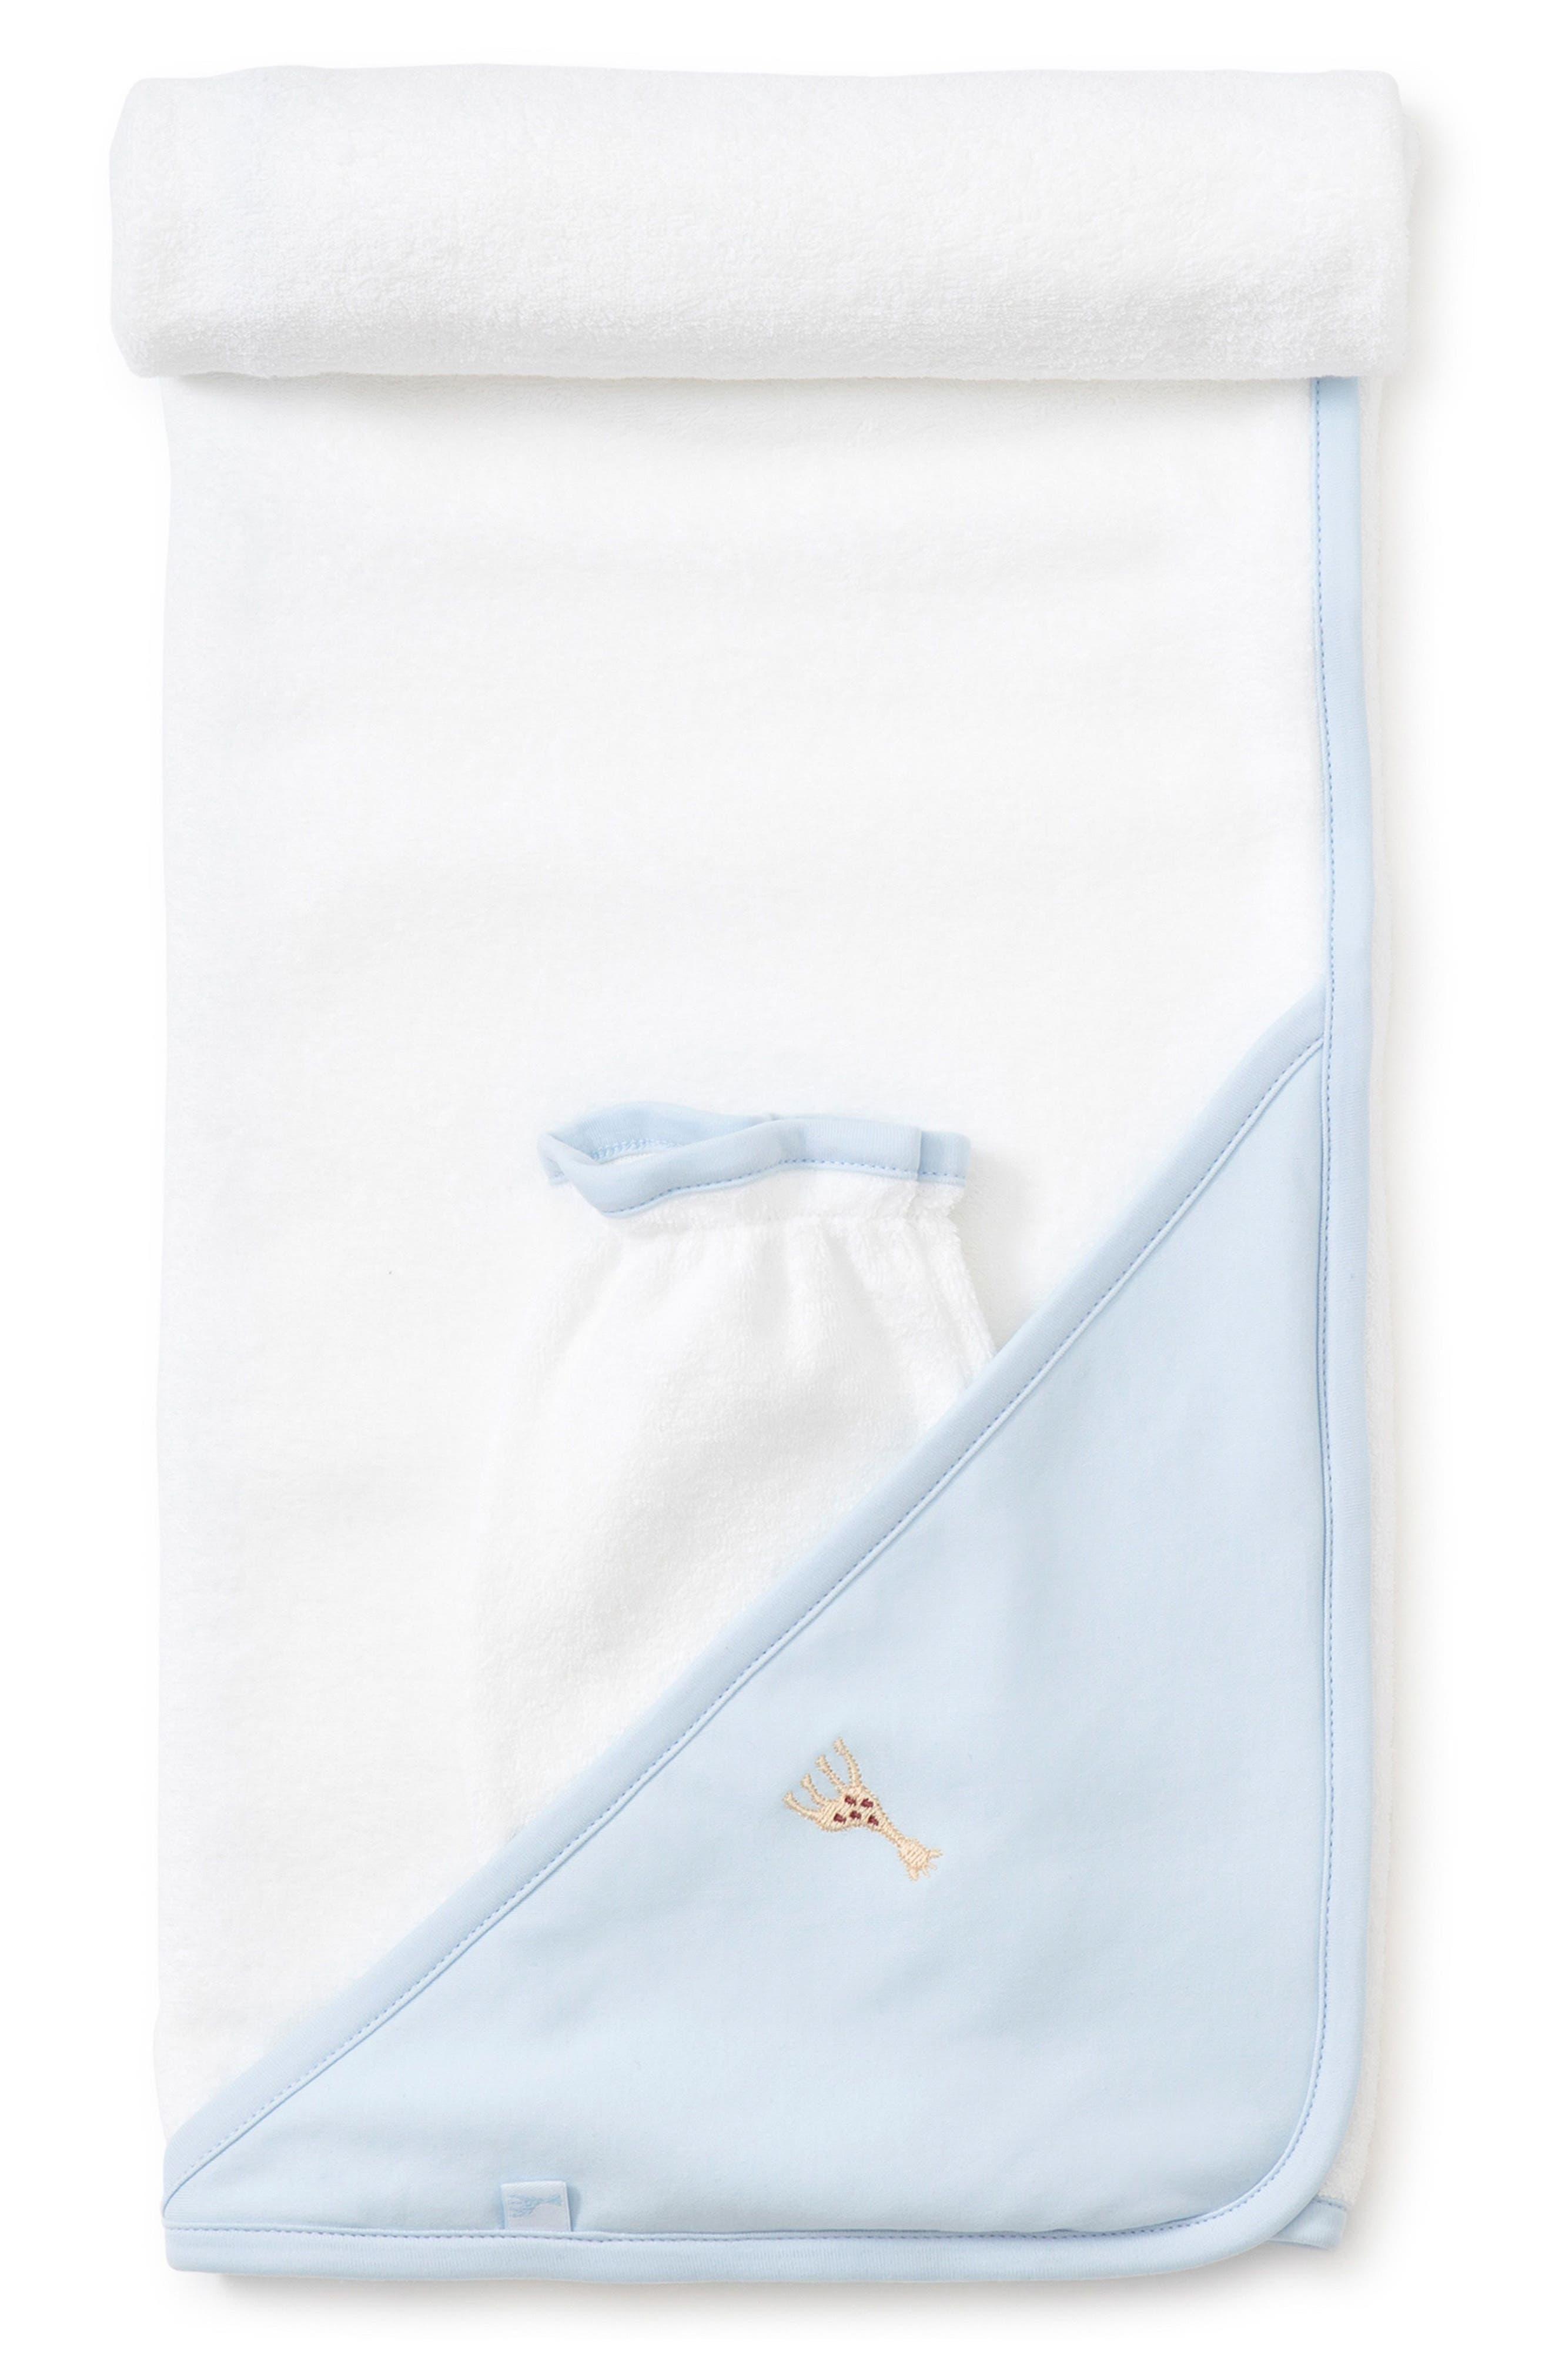 x Sophie la Girafe Hooded Towel & Bath Mitt Set,                         Main,                         color, White/ Light Blue